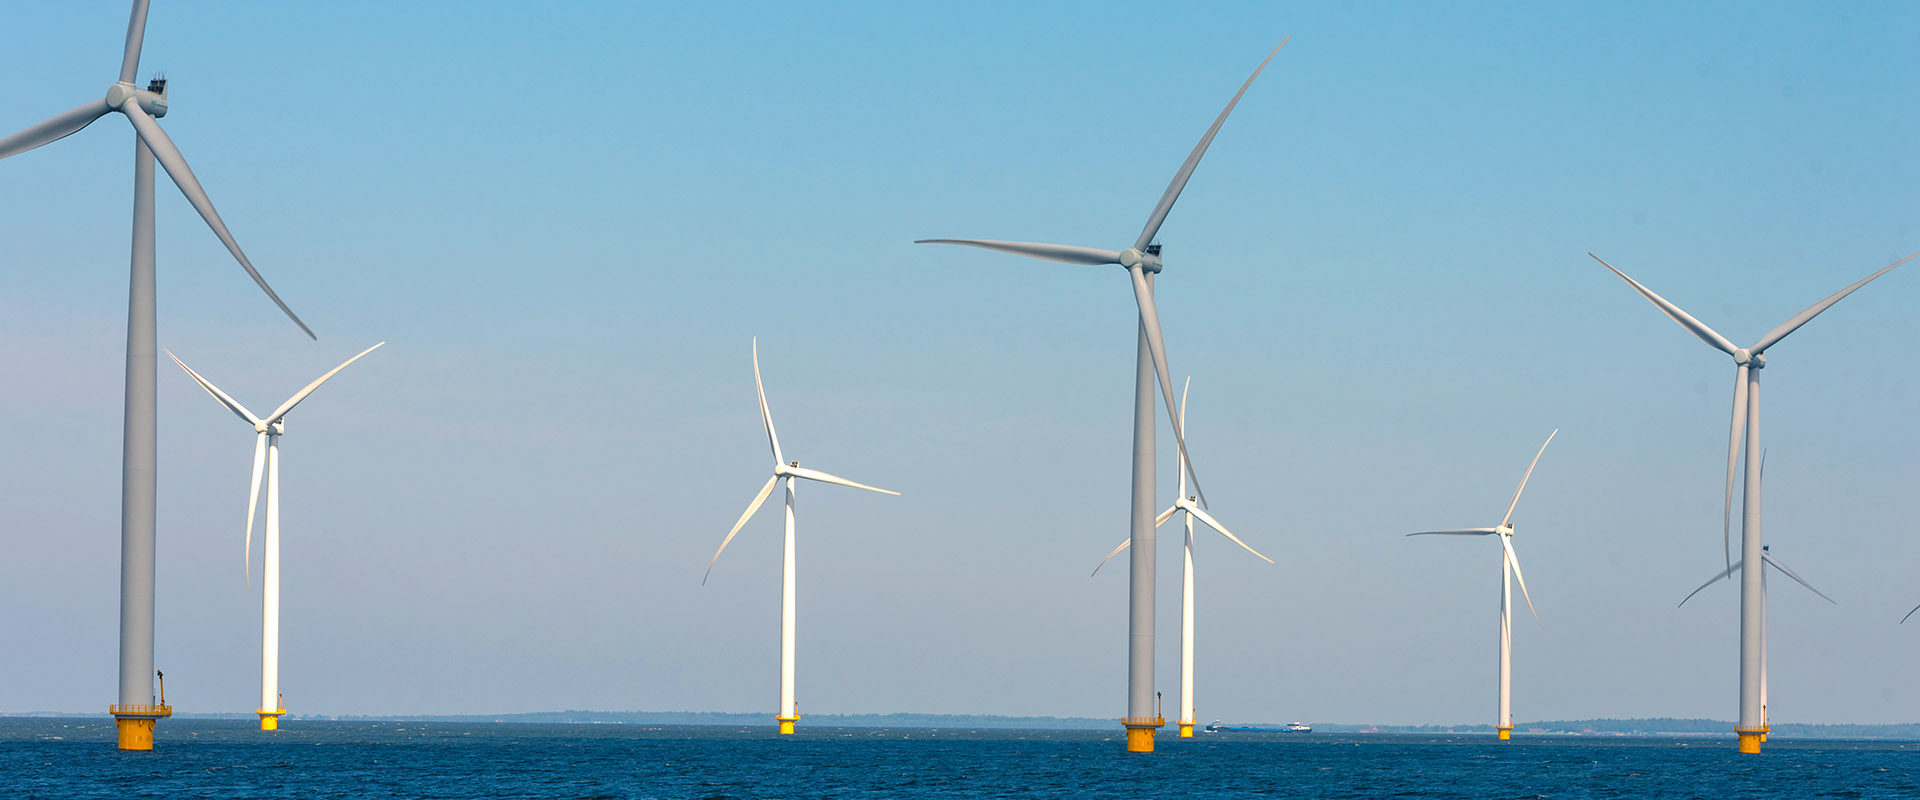 Offshore windfarm | Orga